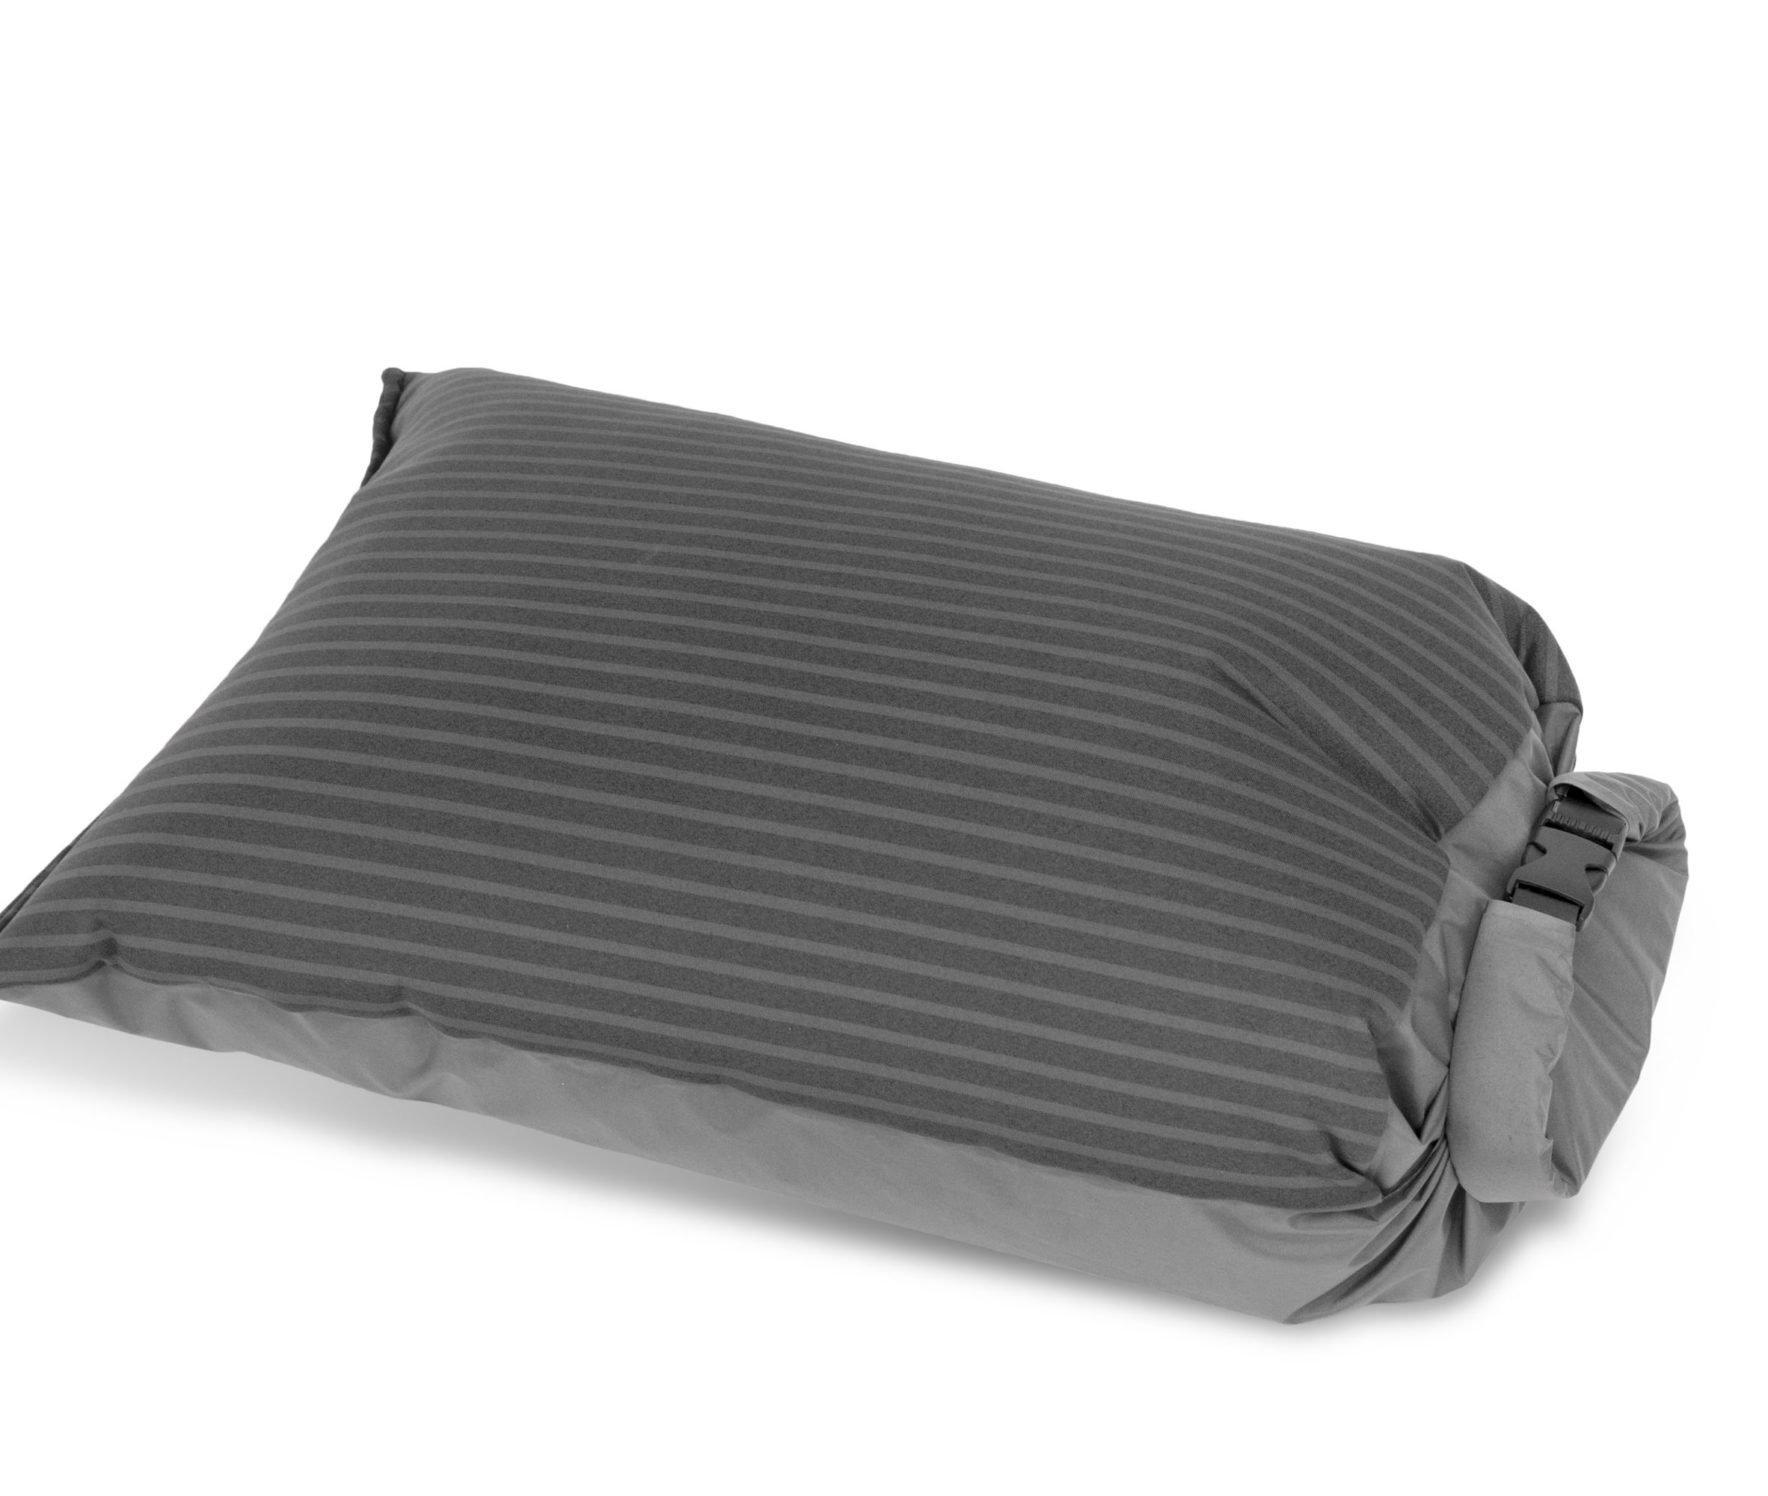 NEMO Fillo Bello 3-in-1 Pillow JRI1NEMOBELLO